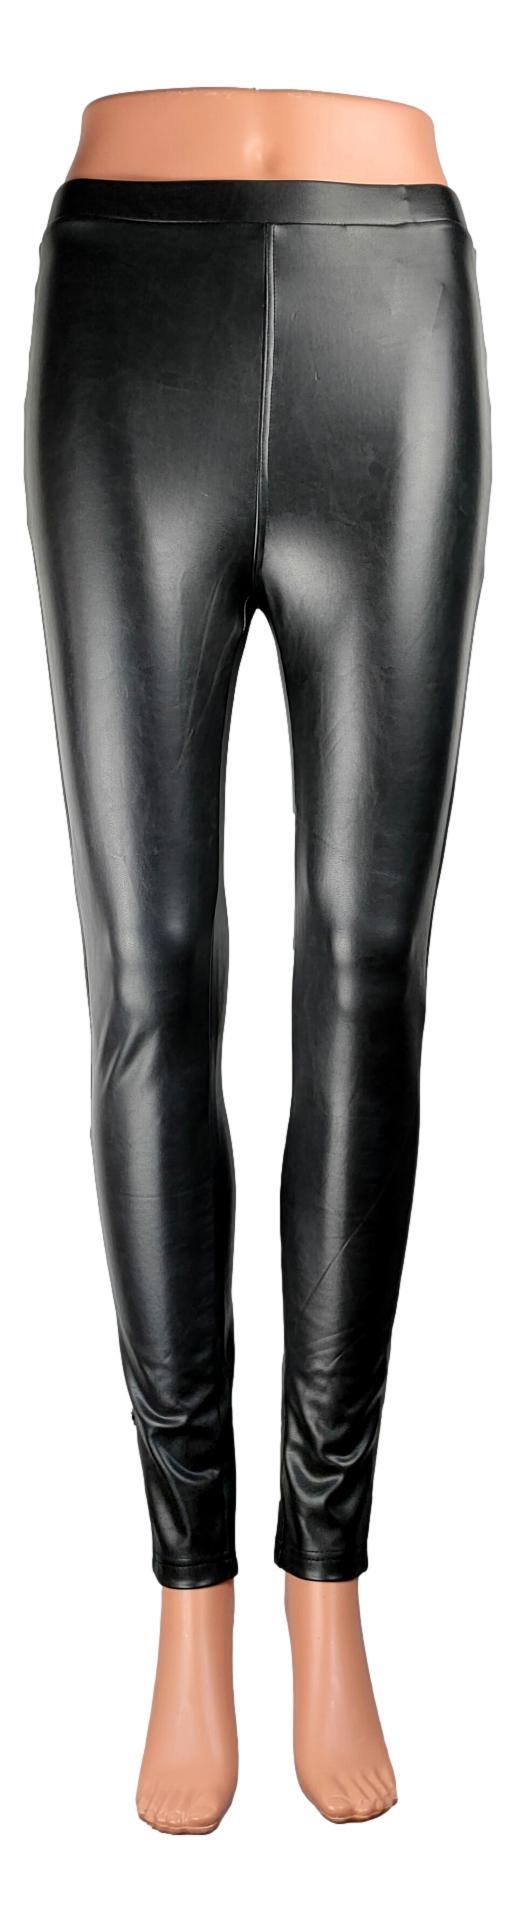 Pantalon VS Miss - Taille 36